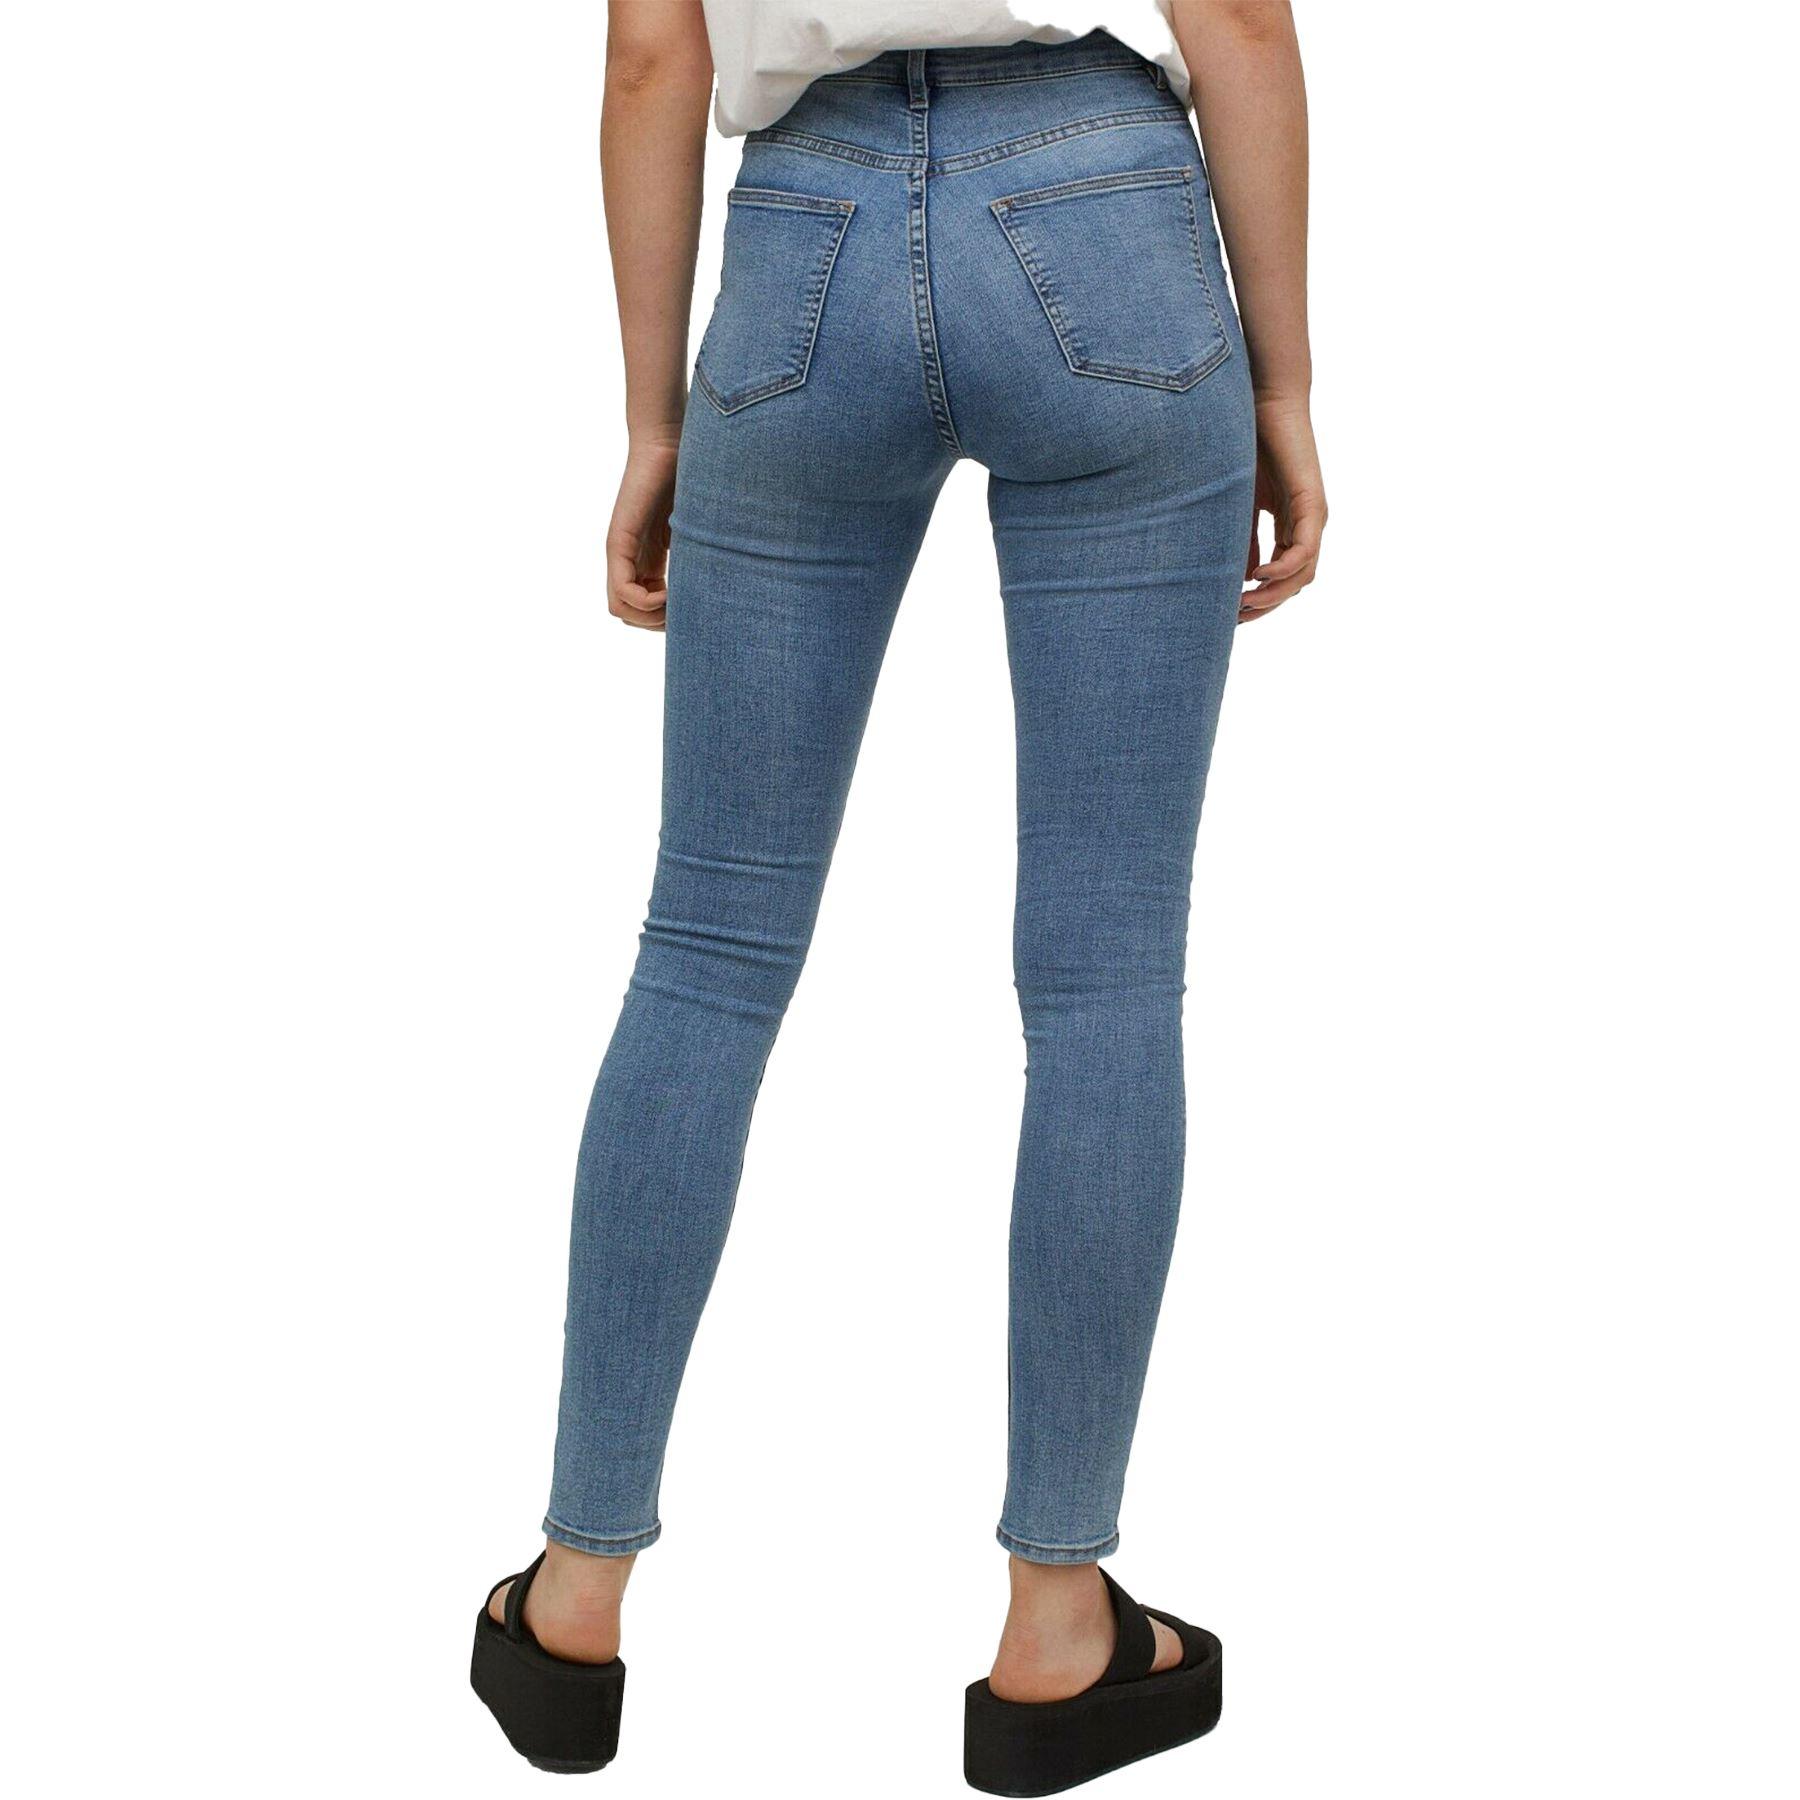 Ex H/&M Divided Ladies Skinny Stretch Spandex Denim Jeans 5 Pockets Basic Soft